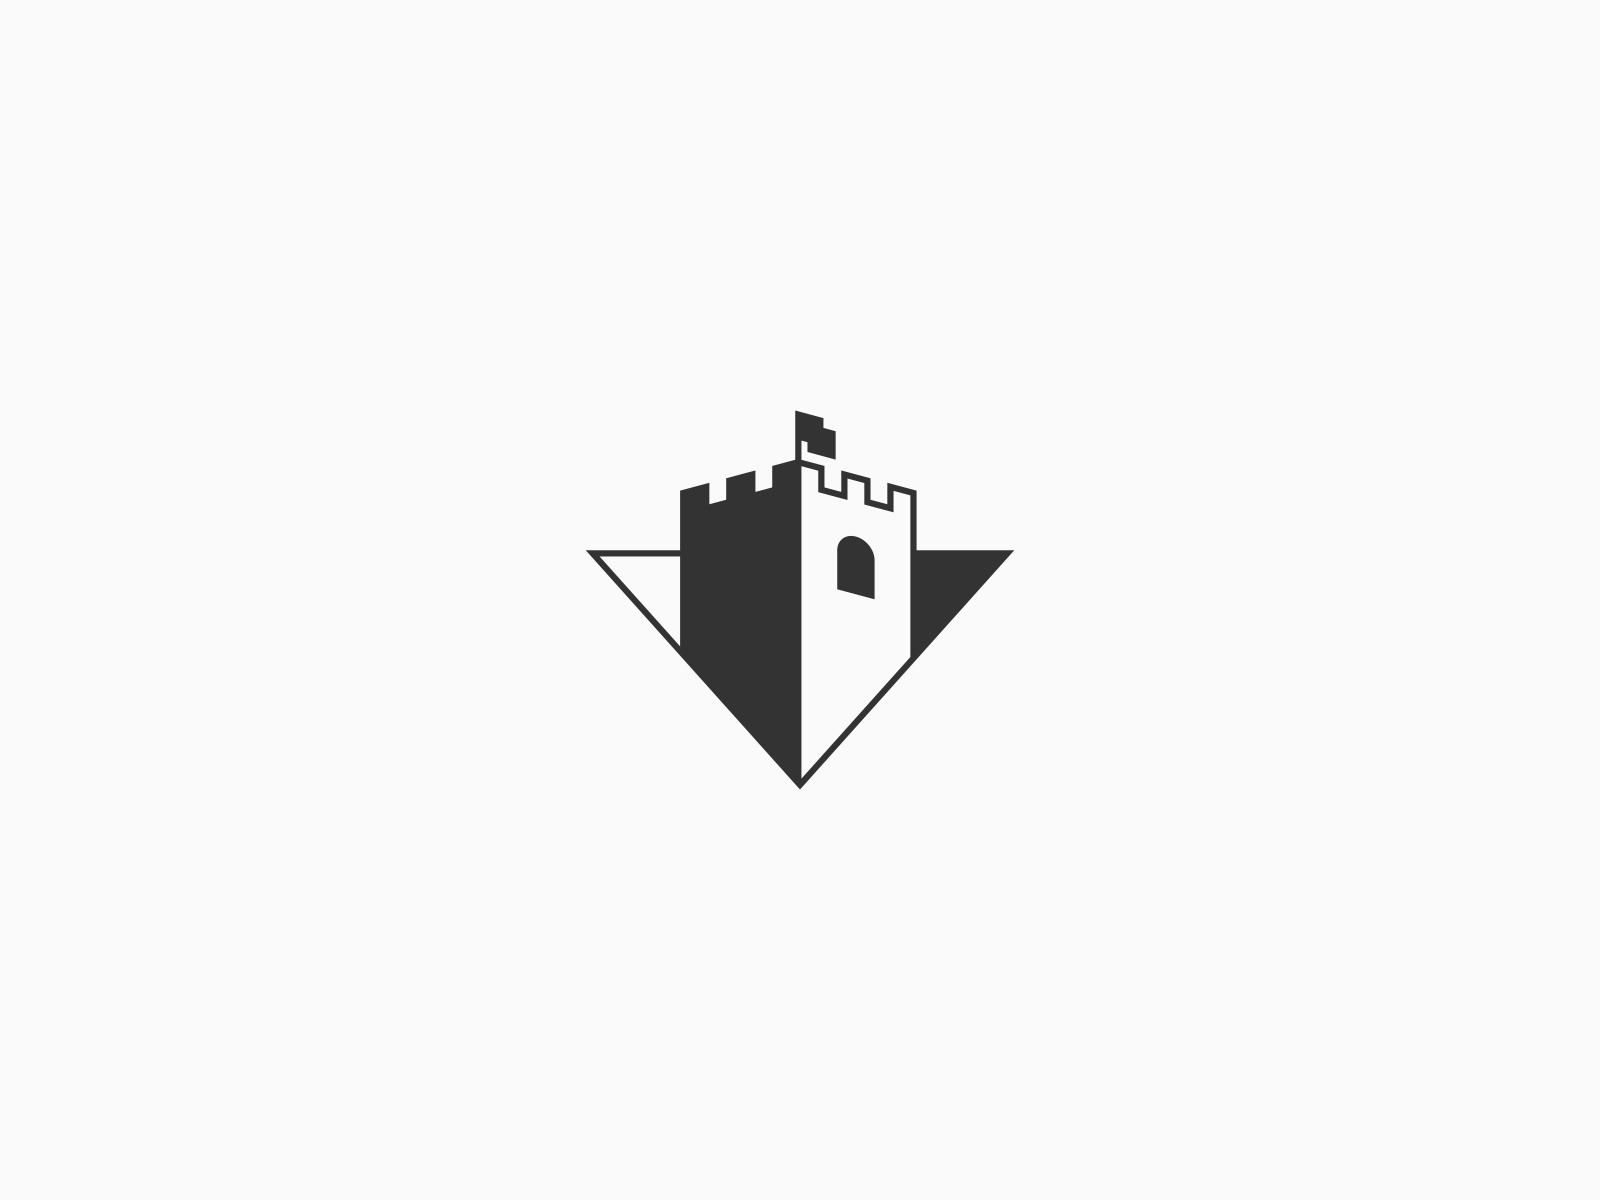 Castle mark 4x